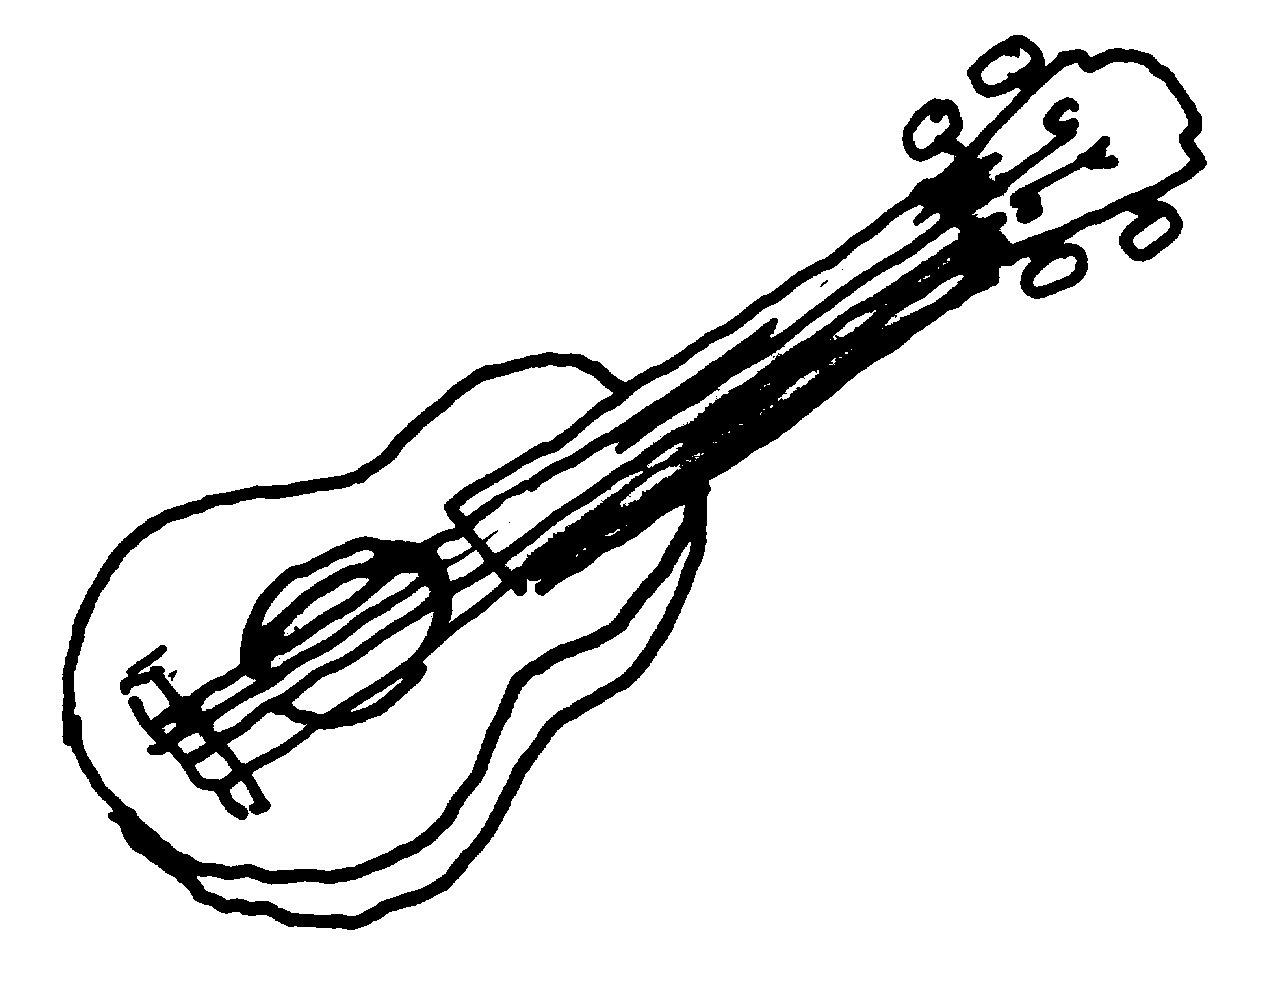 Clip Art Of Guitar